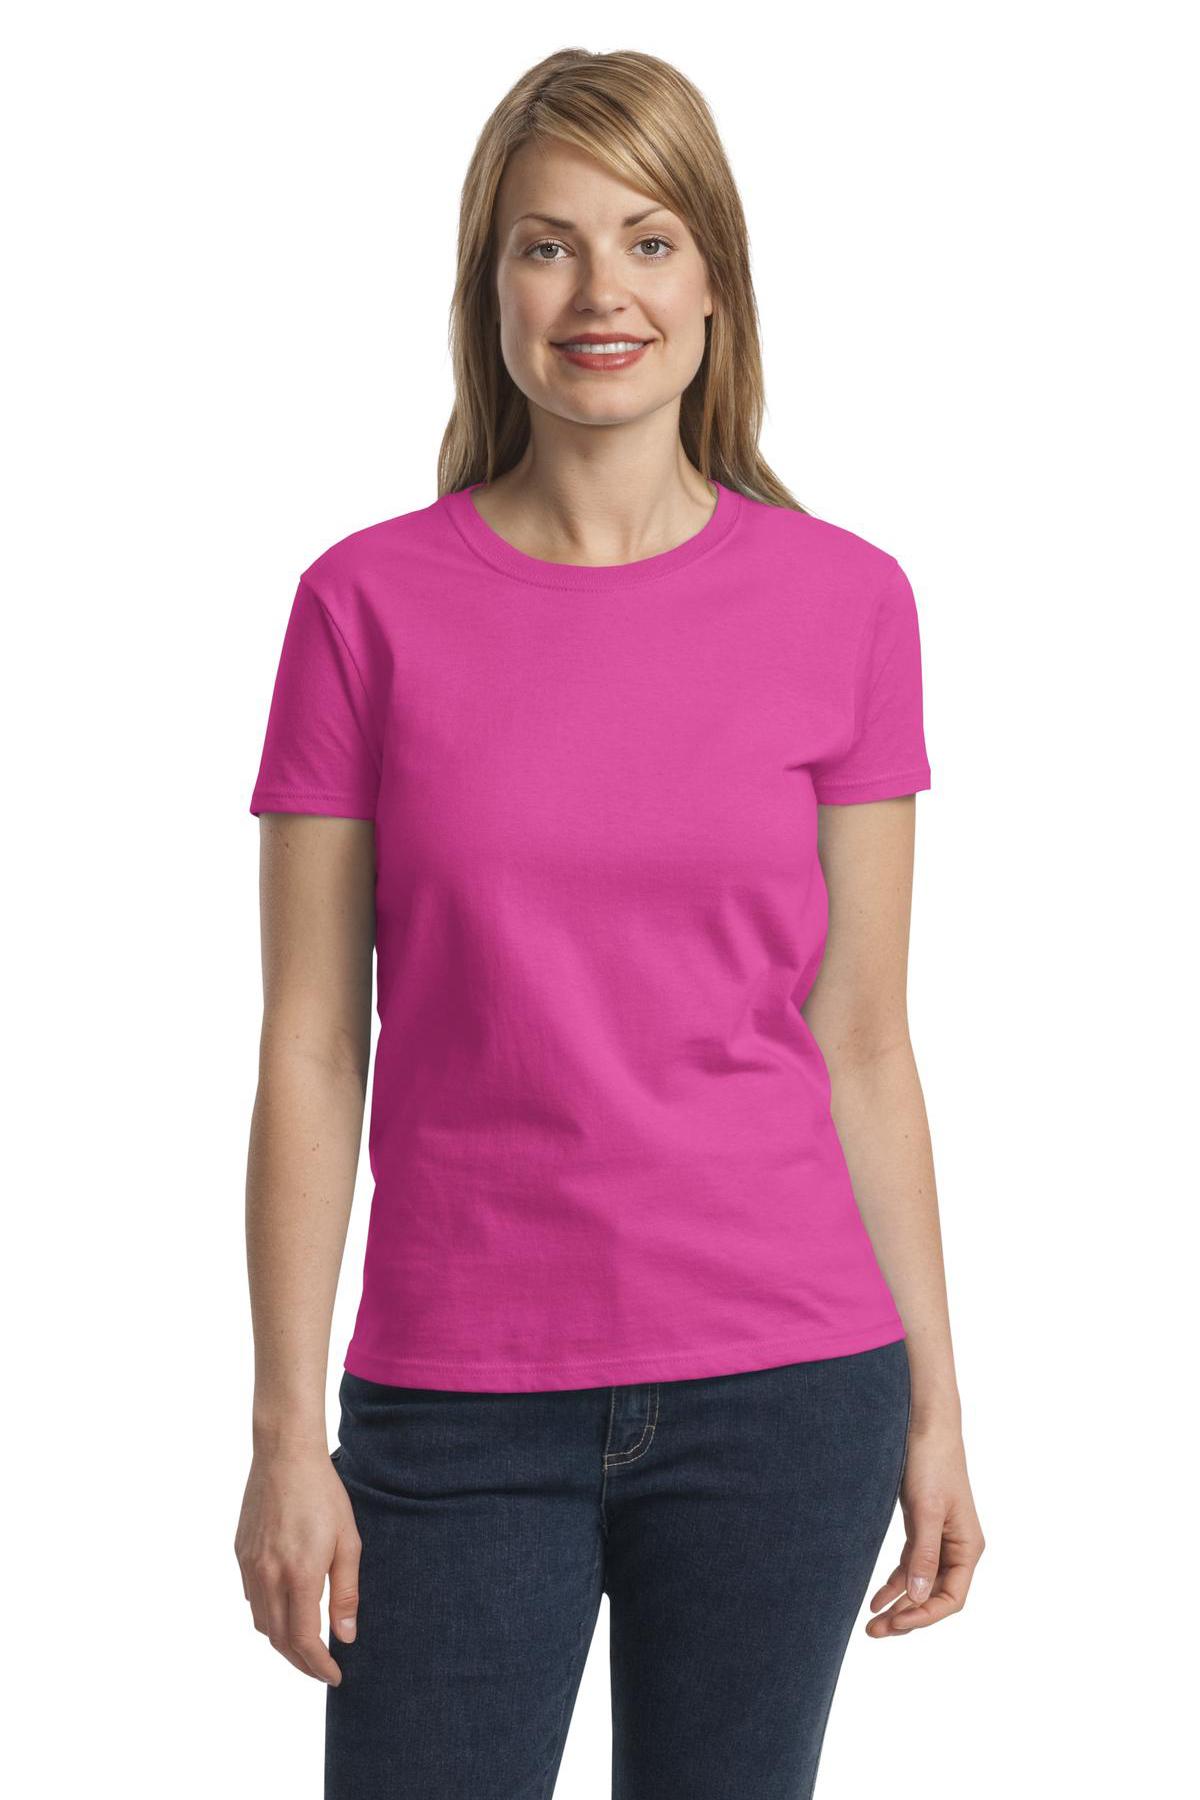 T-Shirts-100-Cotton-10